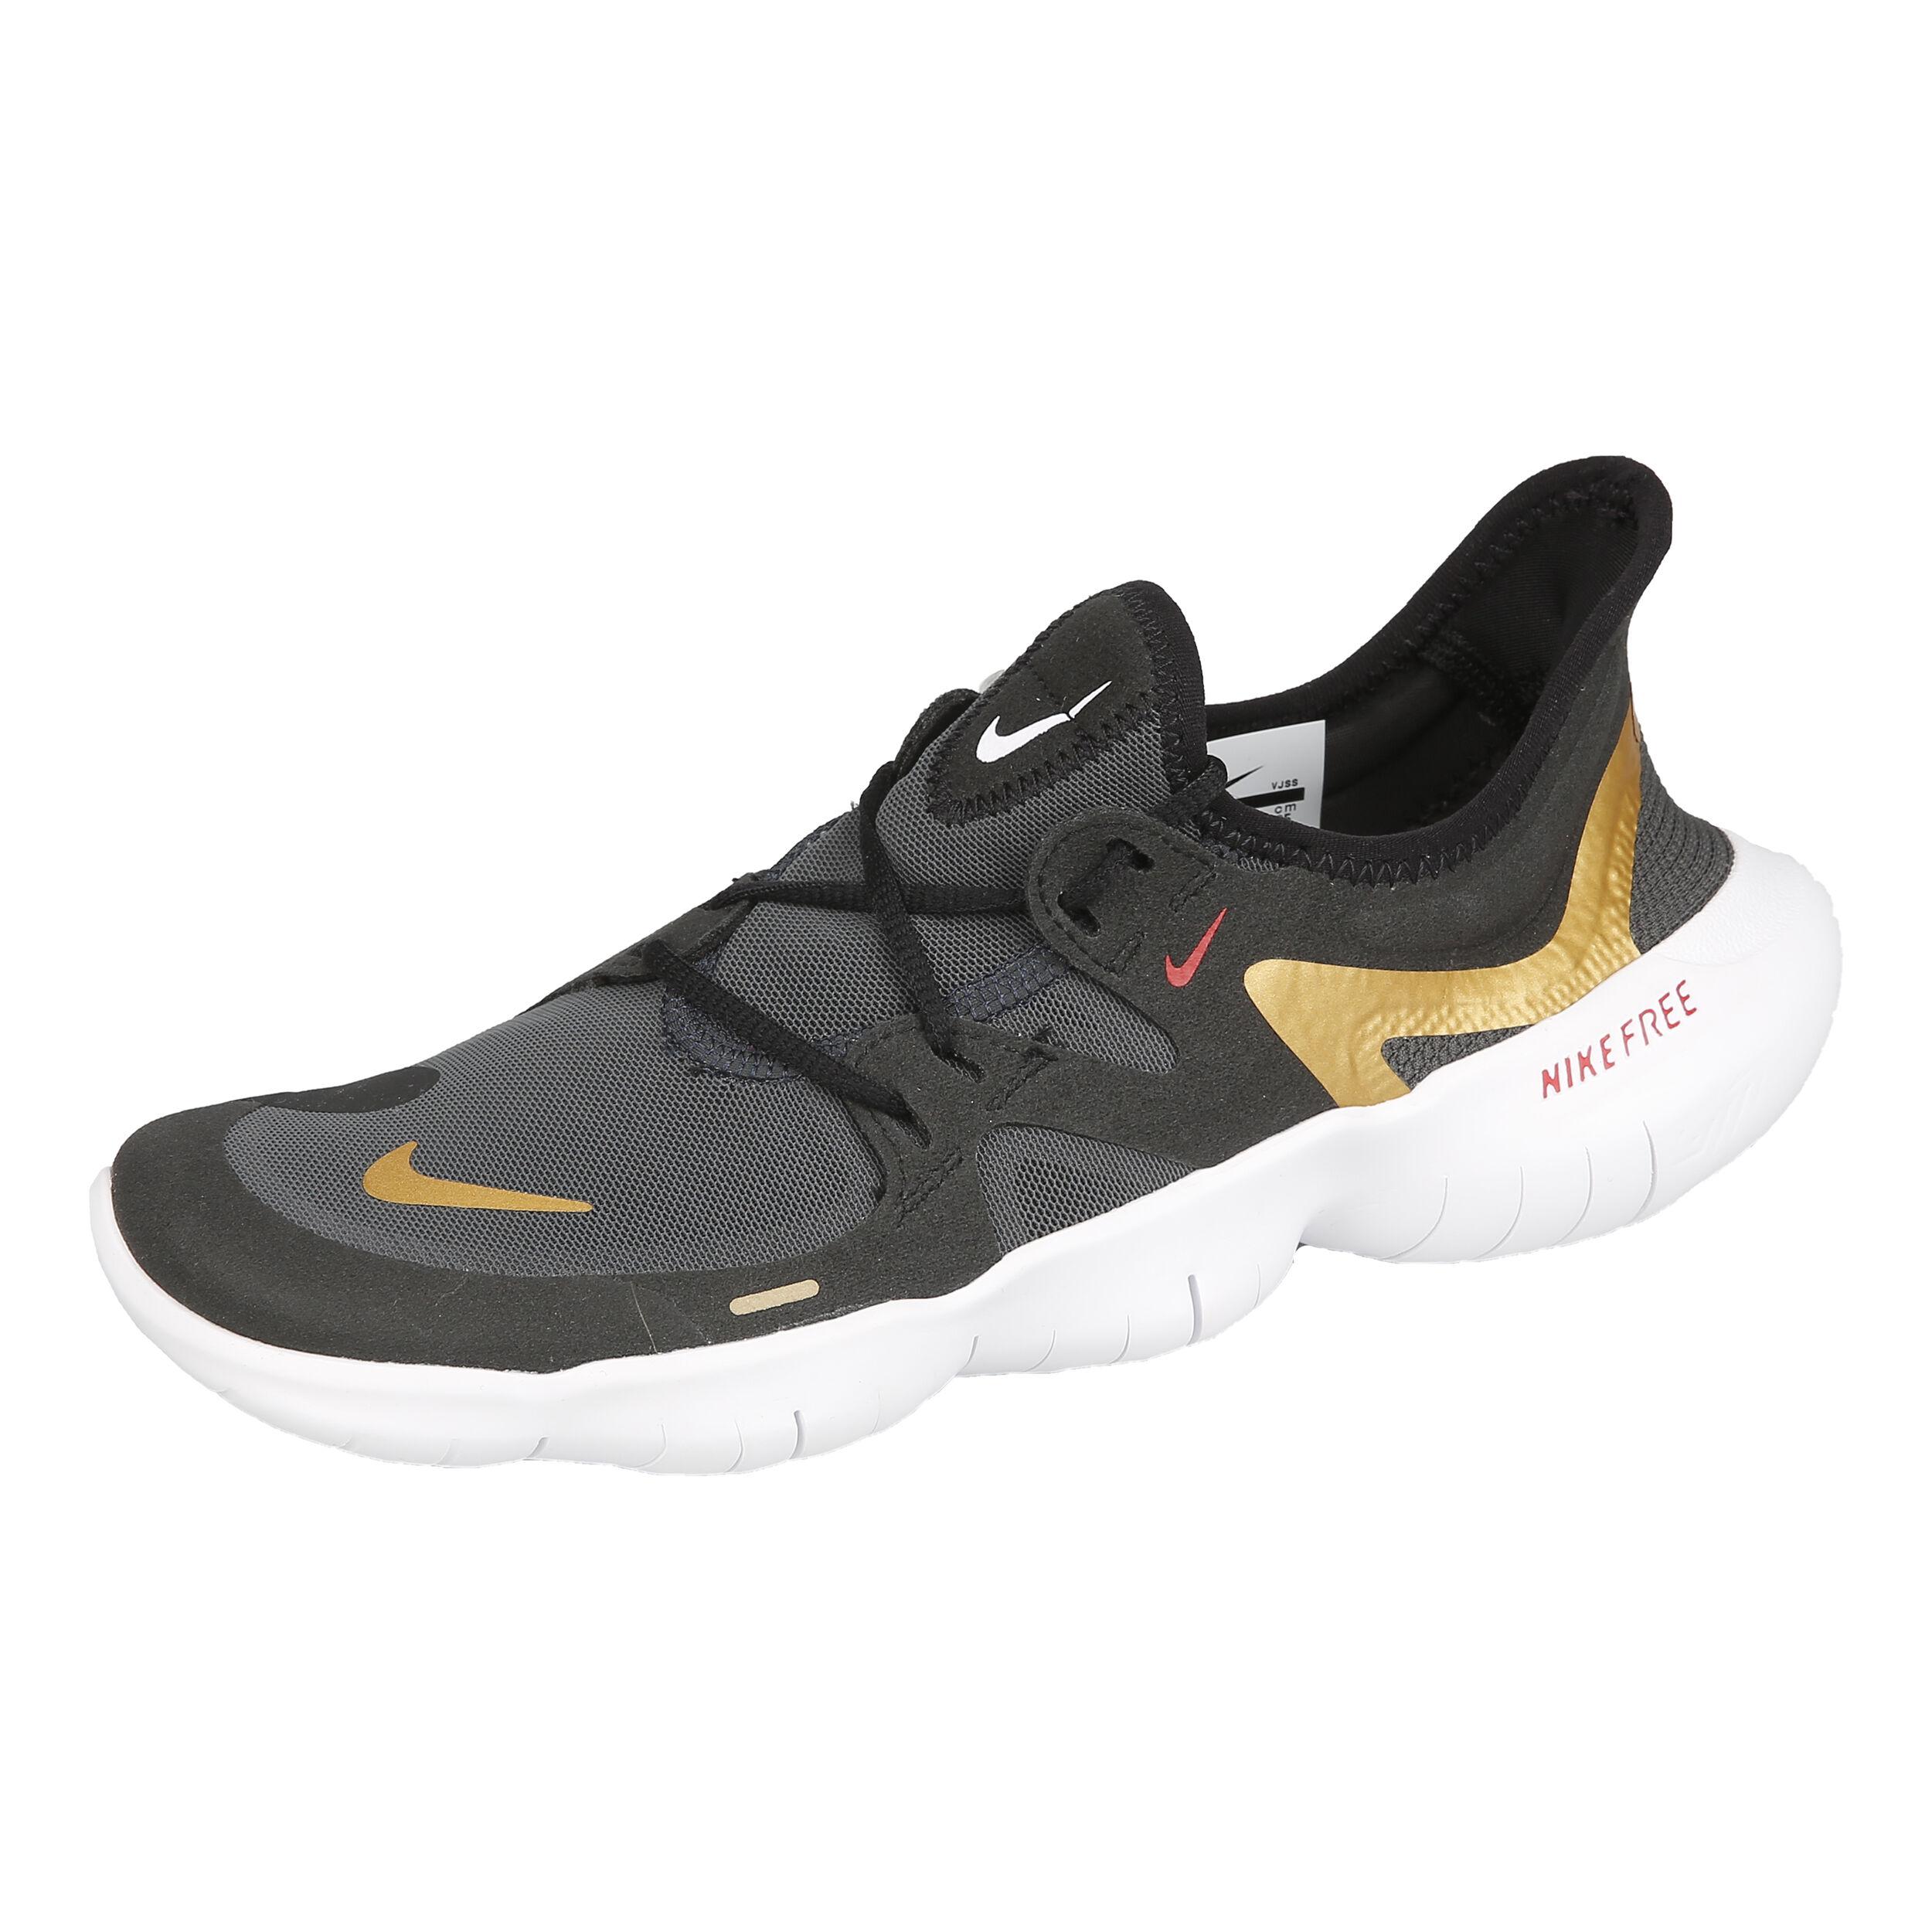 Nike Free Run 5.0 Neutralschuh Damen Schwarz, Gold online